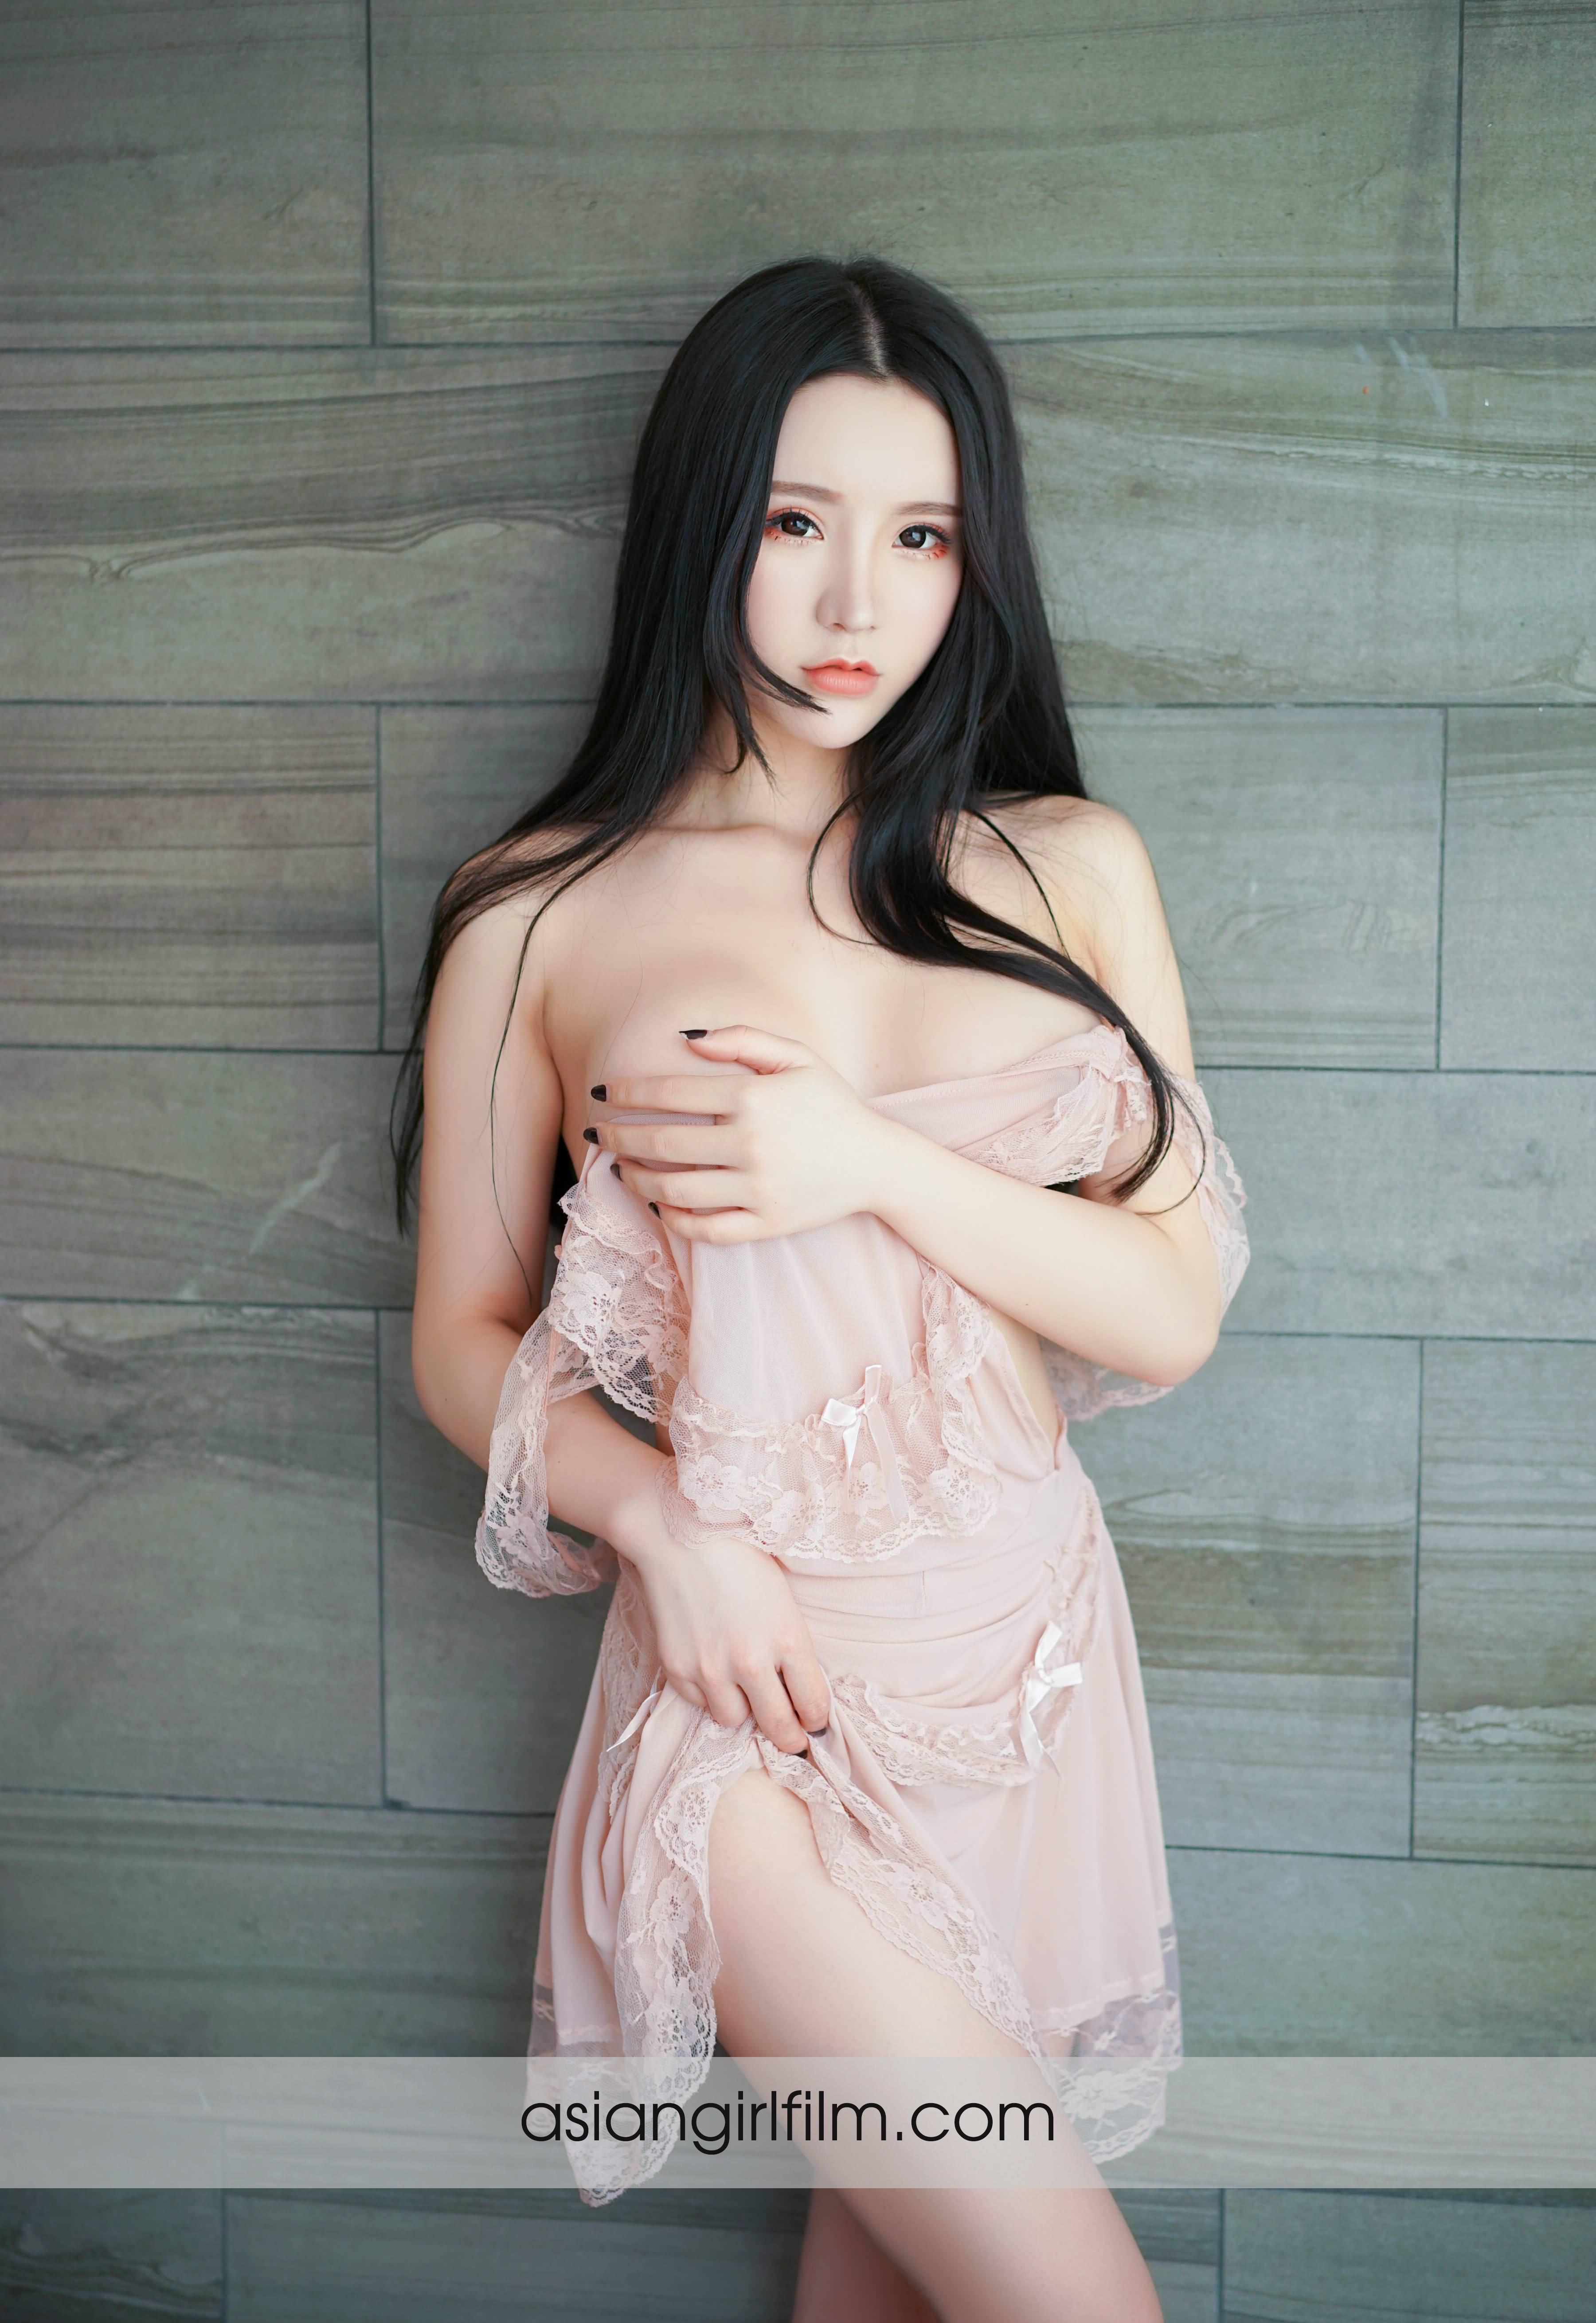 Рот порно грудастая китаянка онлайн порно